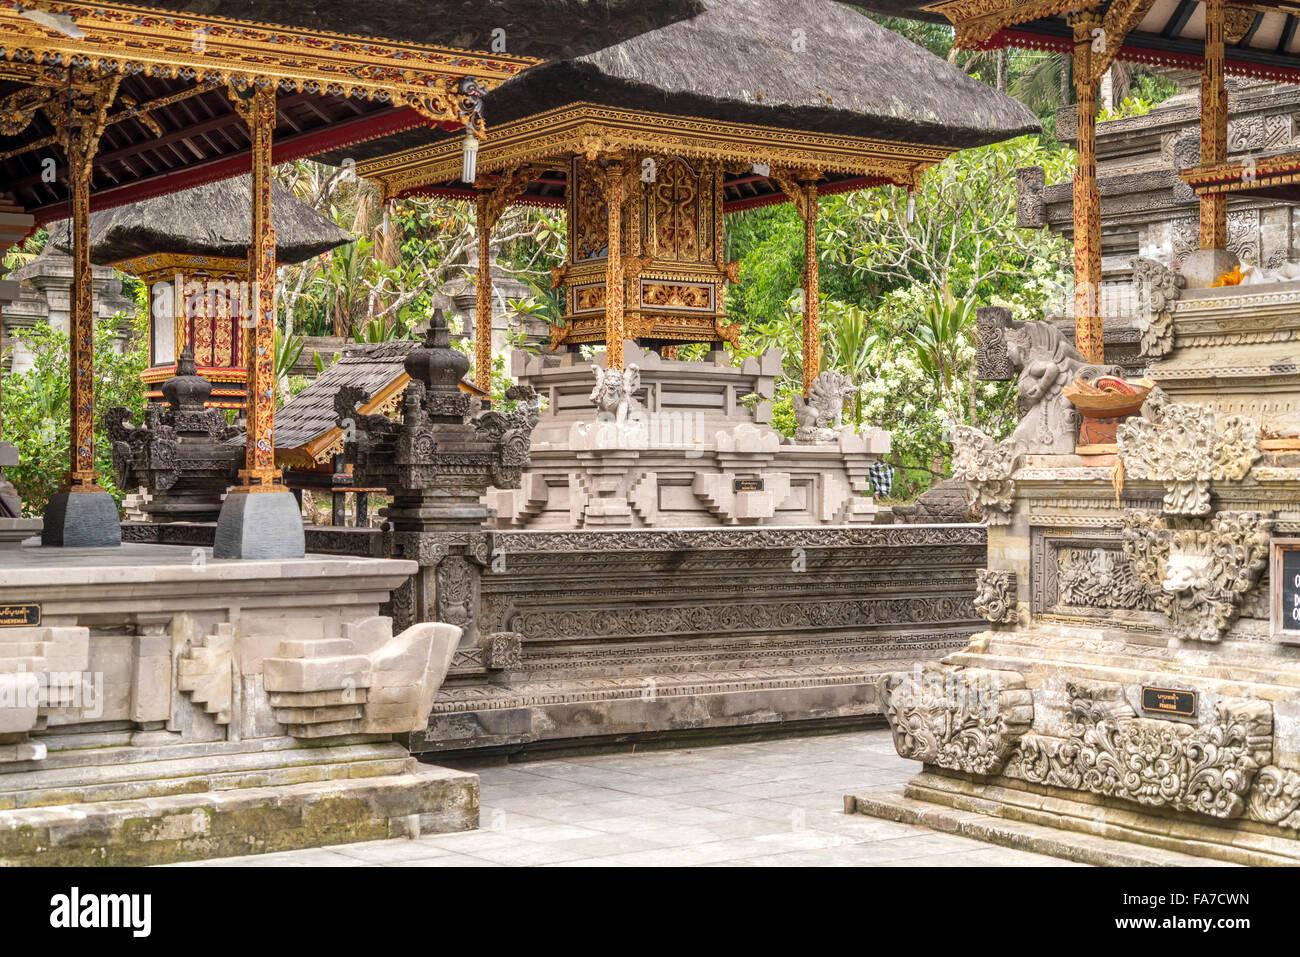 L'Hindu Temple de l'eau près de Tirta Empul Ubud, Bali, Indonésie Photo Stock